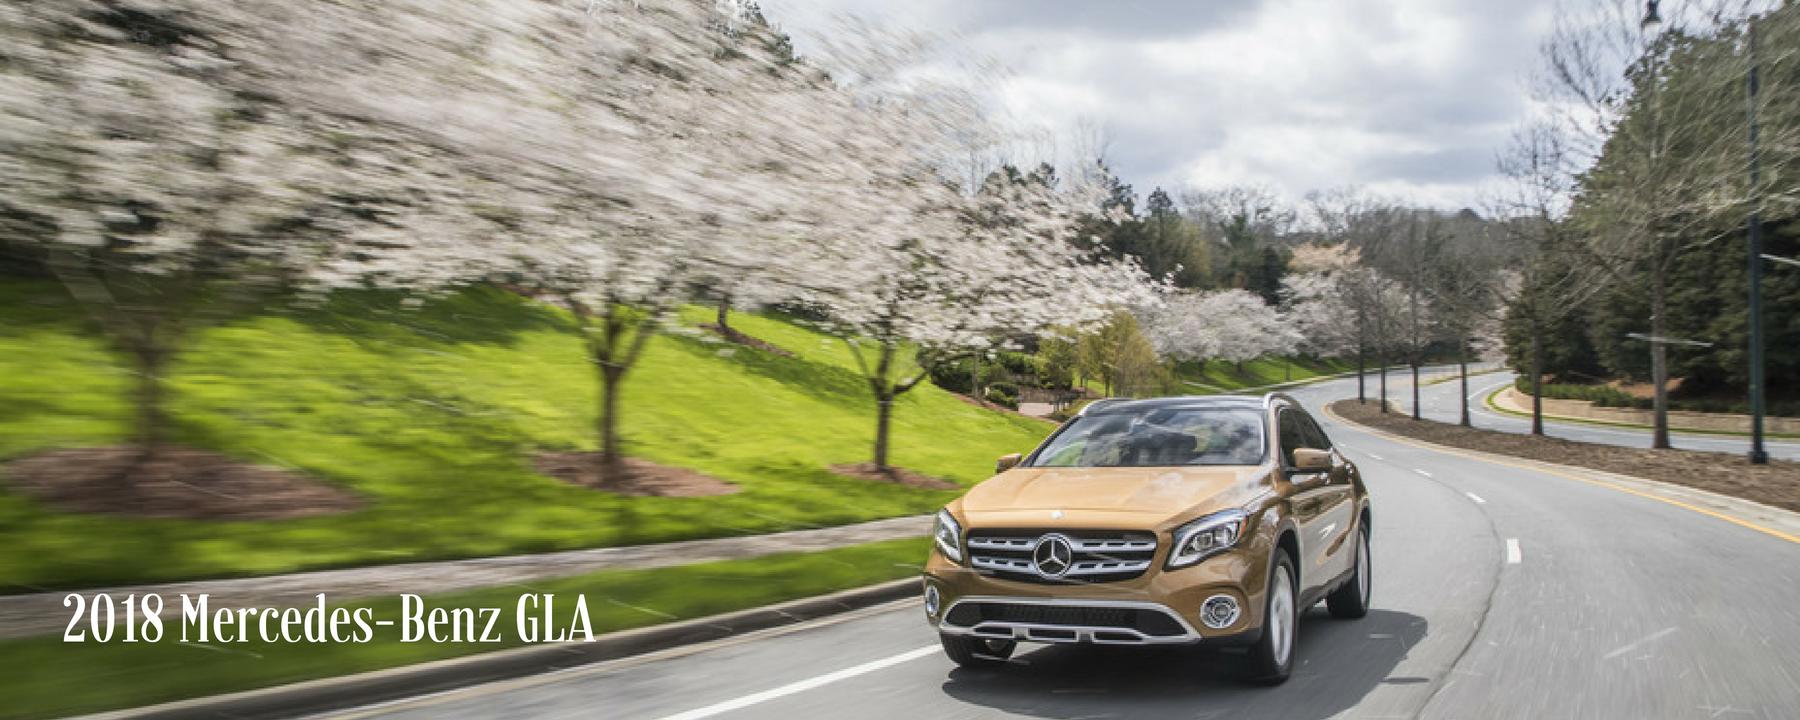 Mercedes-Benz_SUV_GLA